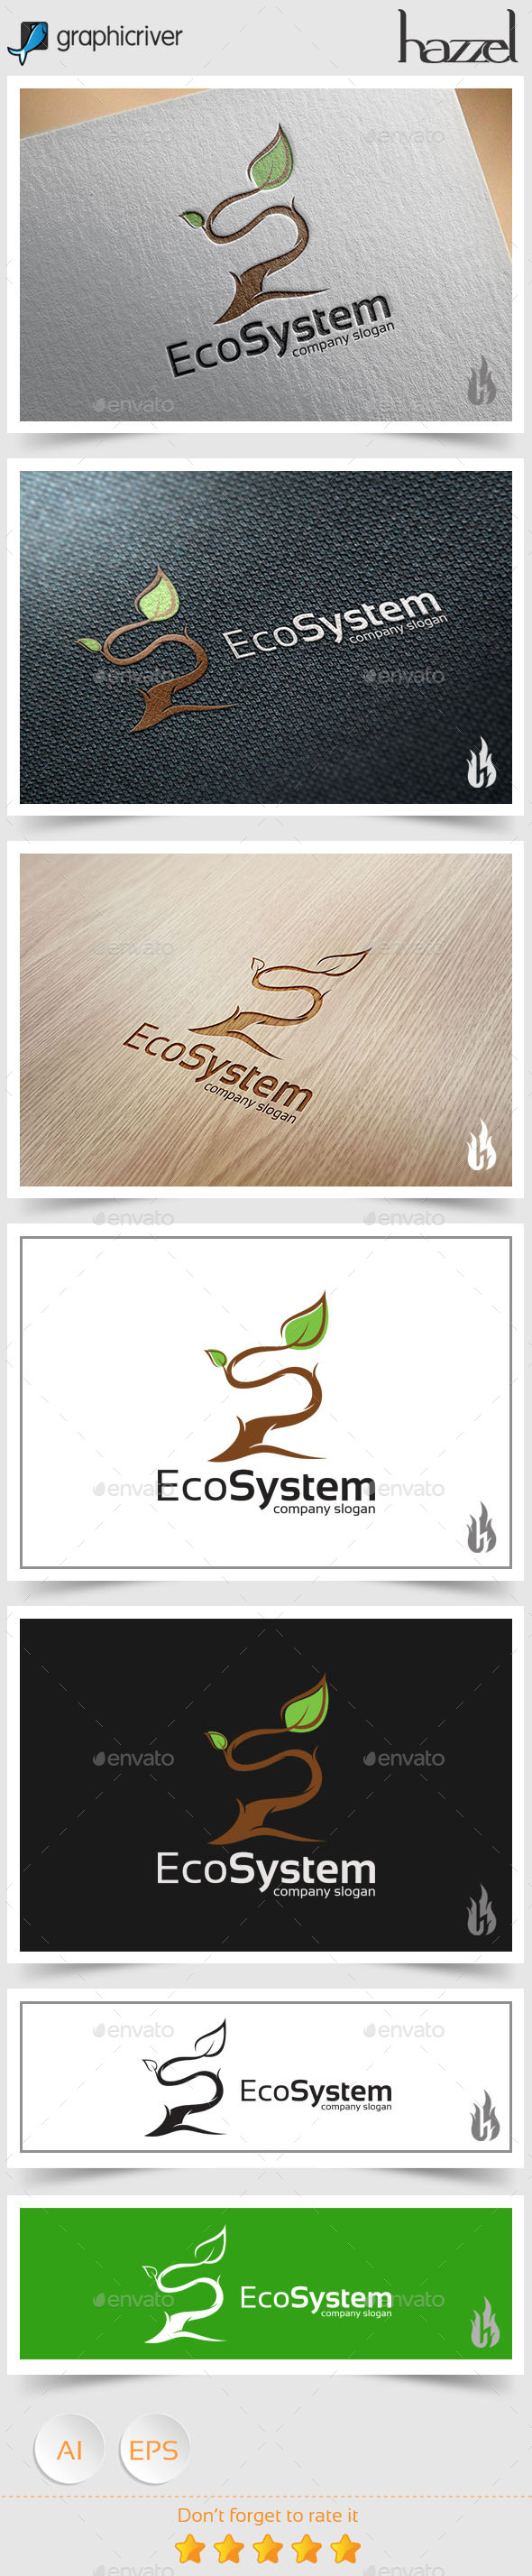 Eco System - Letter S Logo - Nature Logo Templates